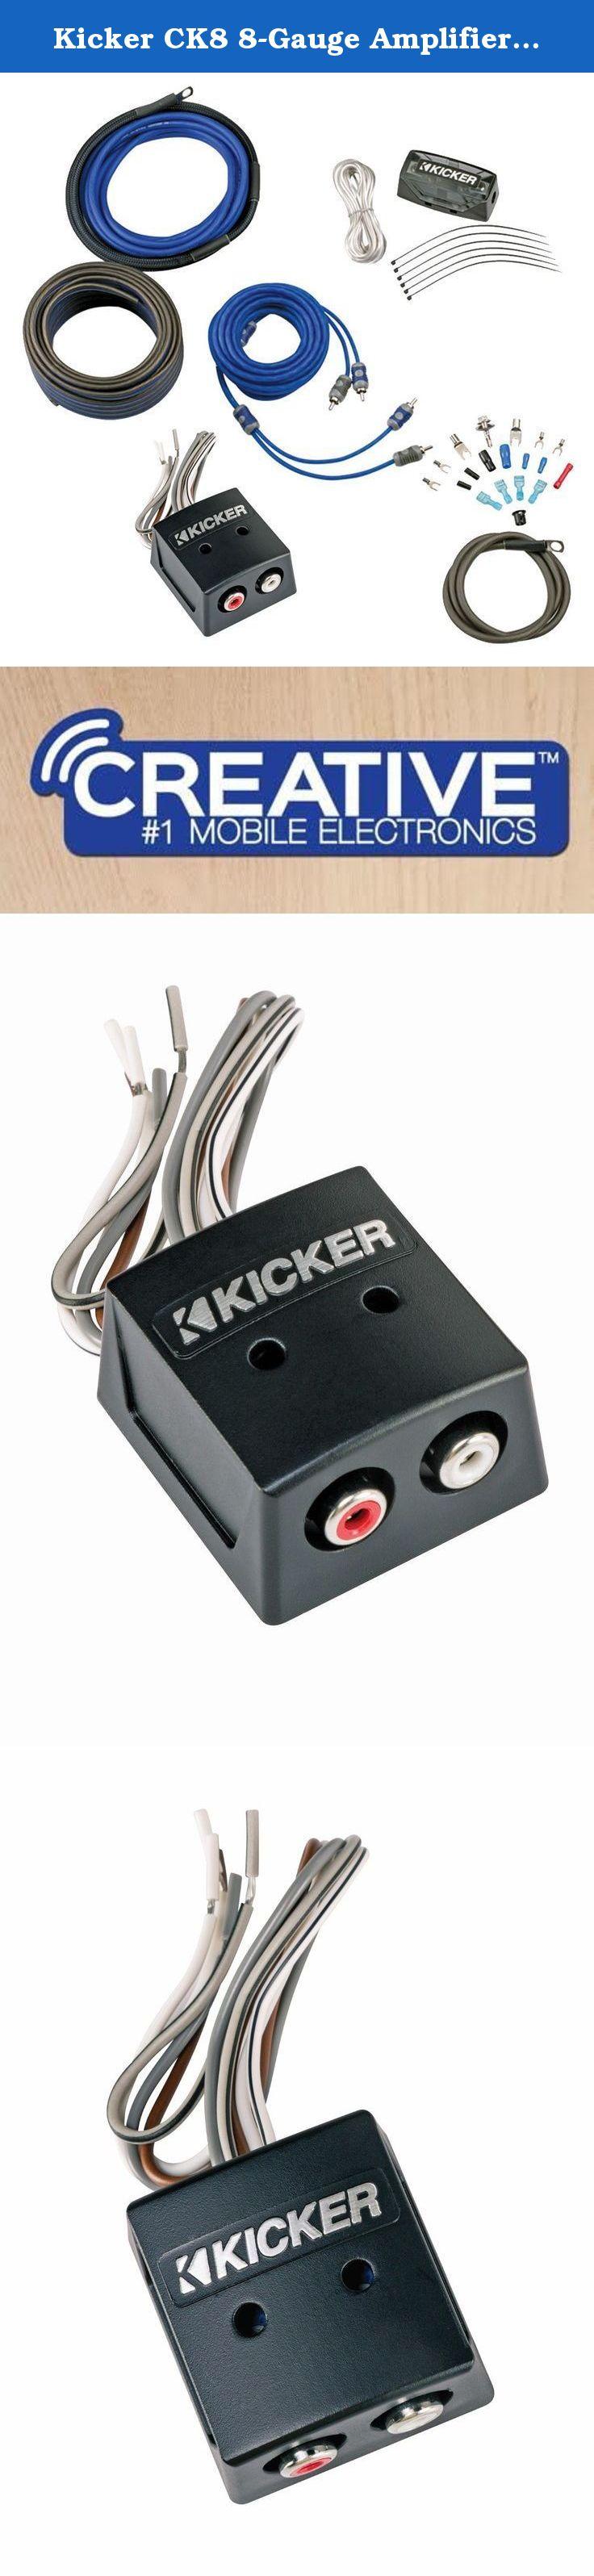 Kicker CK8 8-Gauge Amplifier Kit with KISLOC Line Output Converter